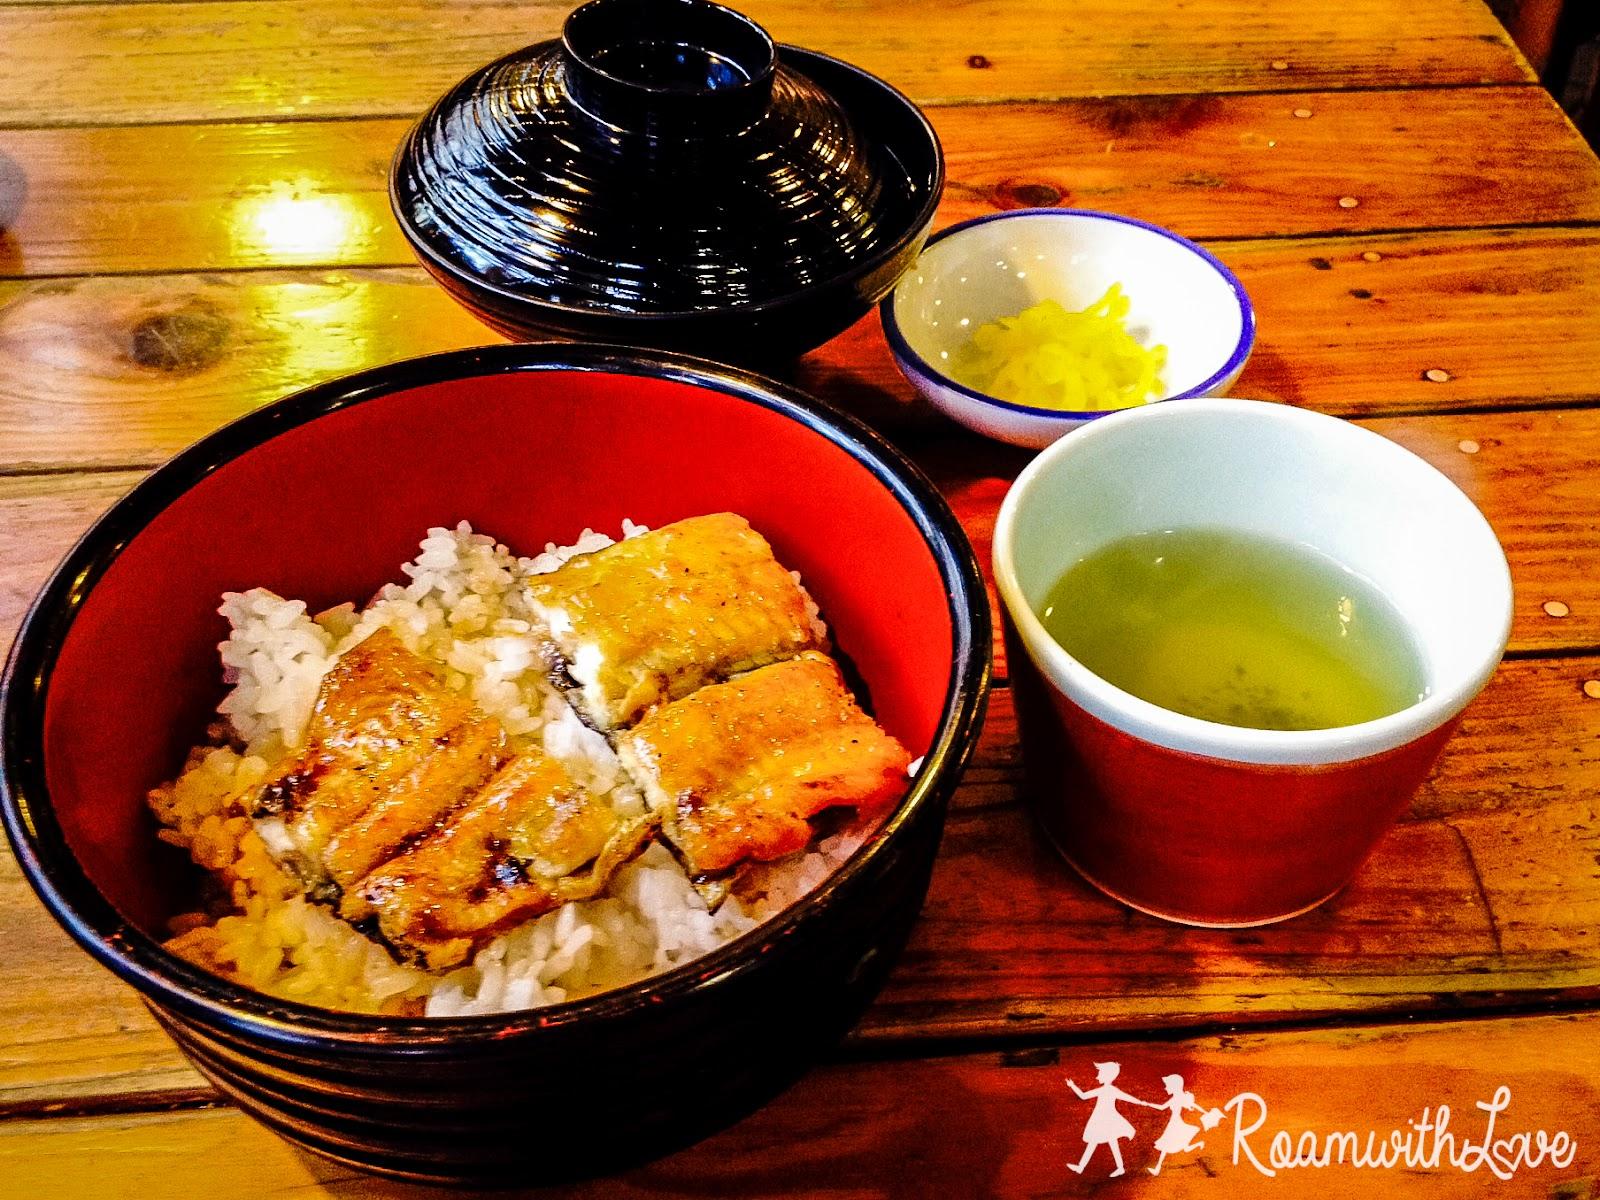 Japan,kyoto,review,เกีนวโต,รีวิว,ทริป,สวีท,ญี่ปุ่น,คันไซ,inari,fushimi,ฟูชิมิ อินาริ,ปลาไหล